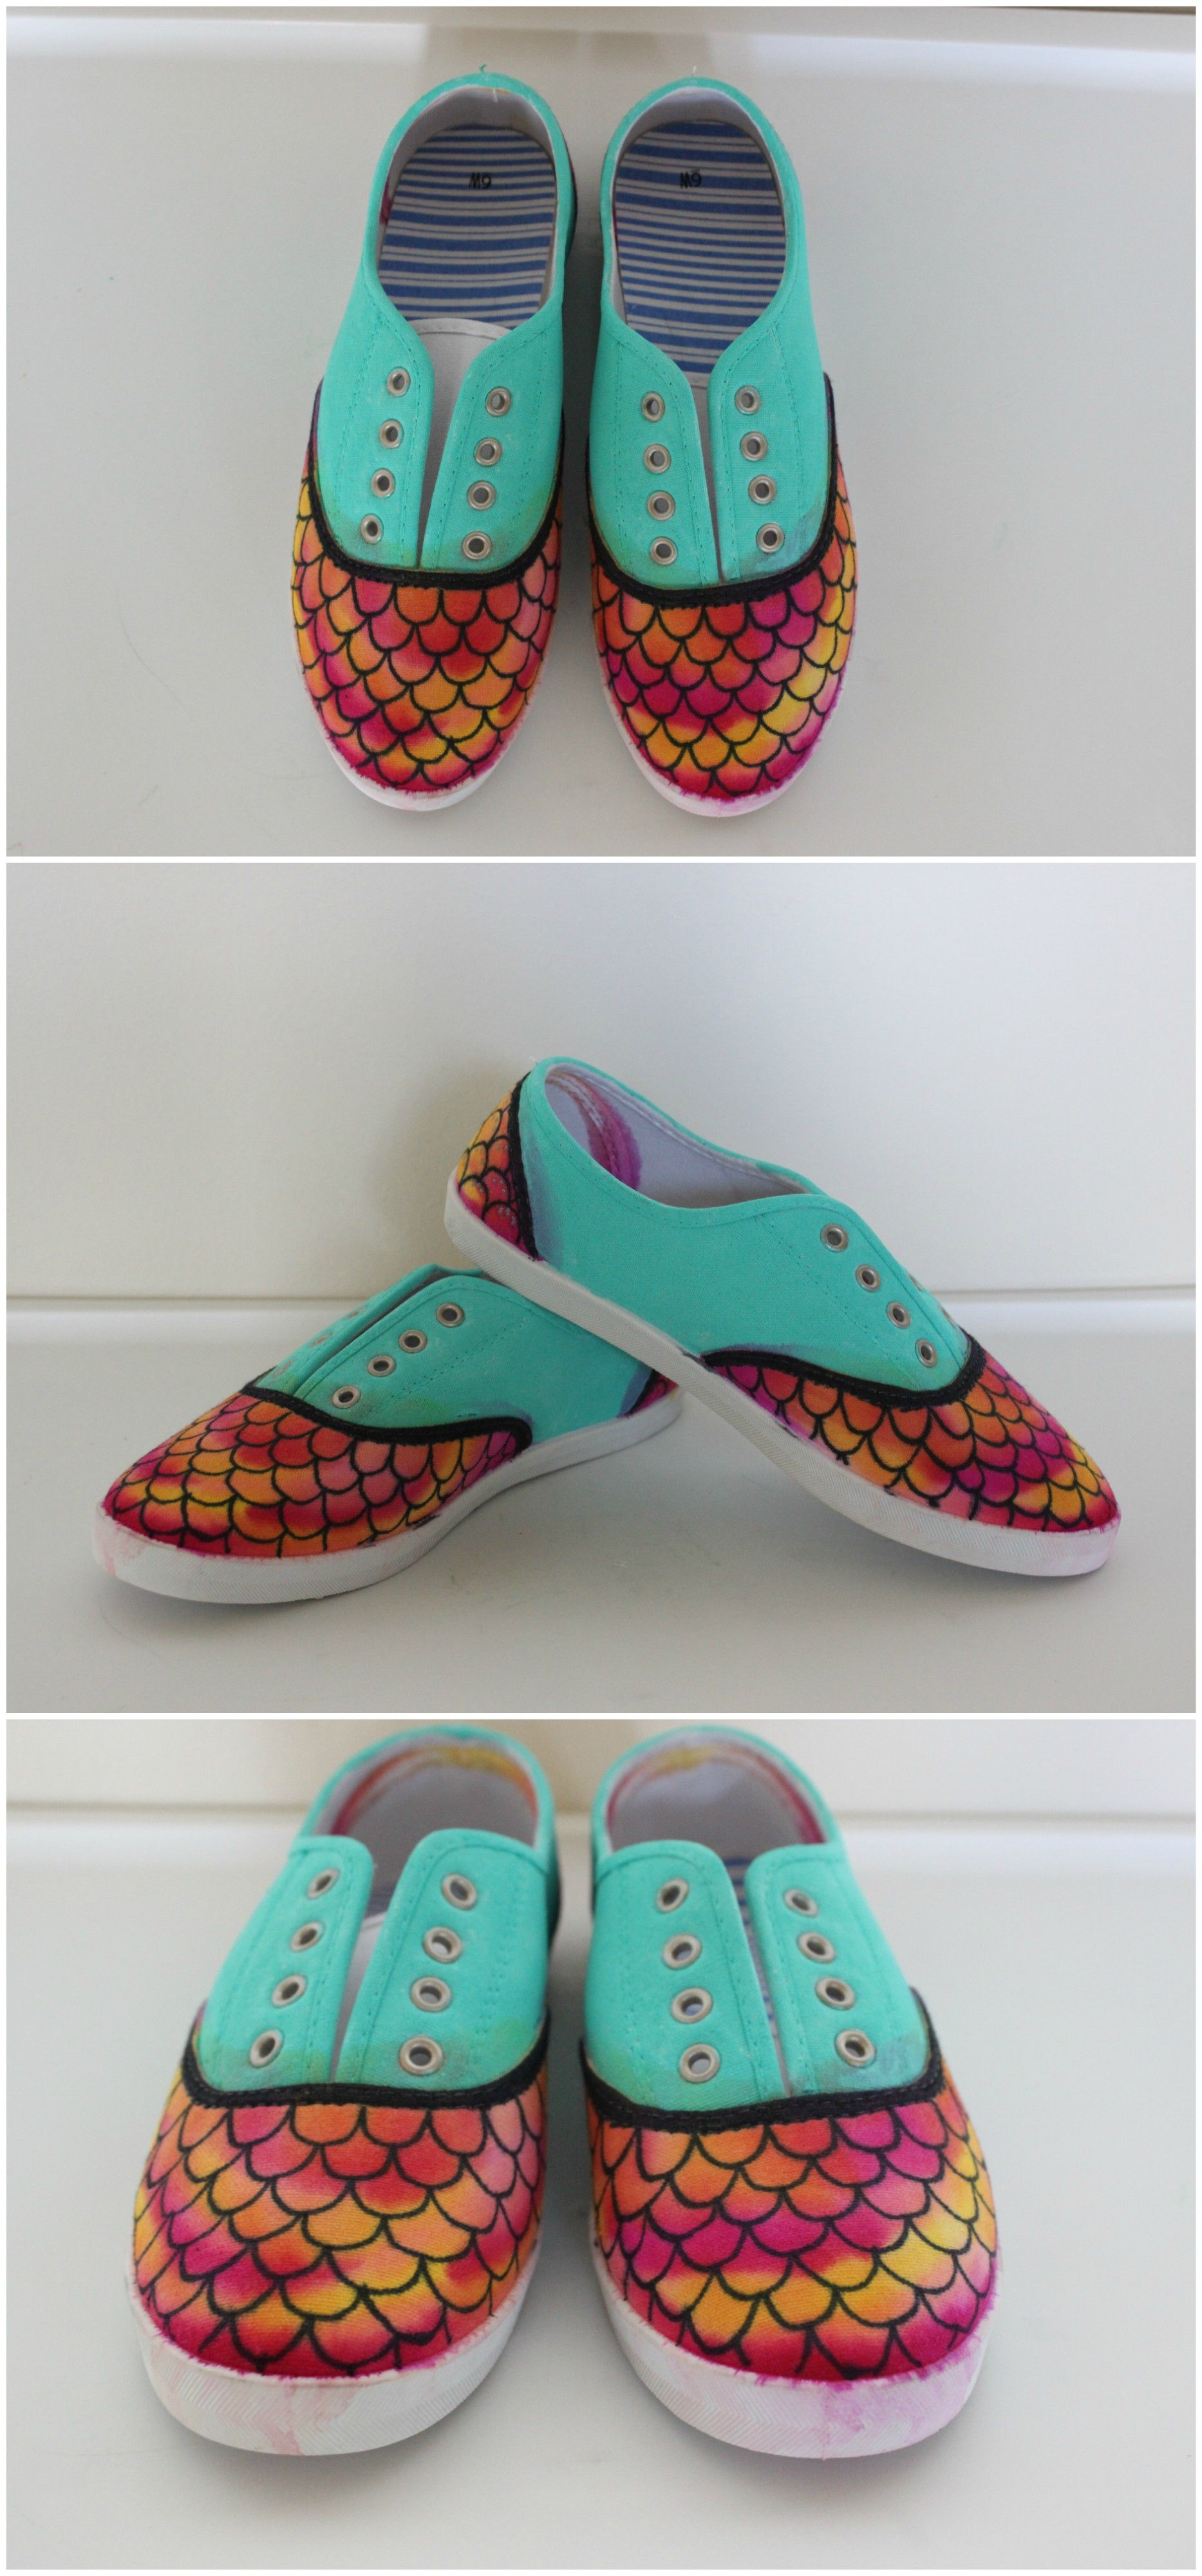 Dragon scales mermaid paint sharpie alcohol diy shoes